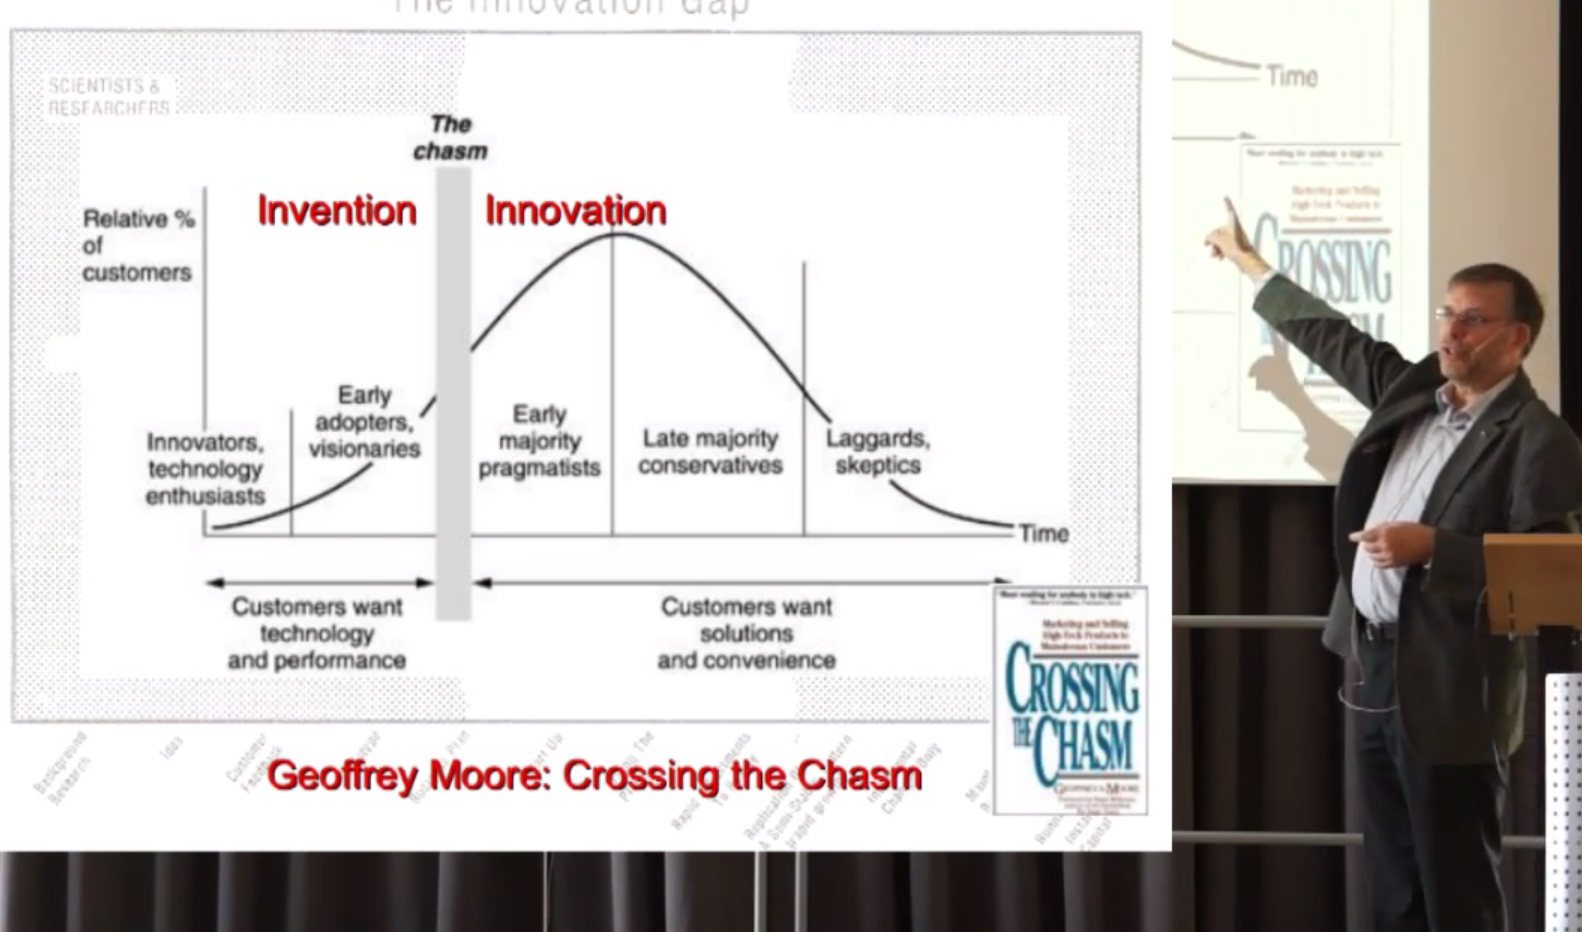 Chasm of Innovation